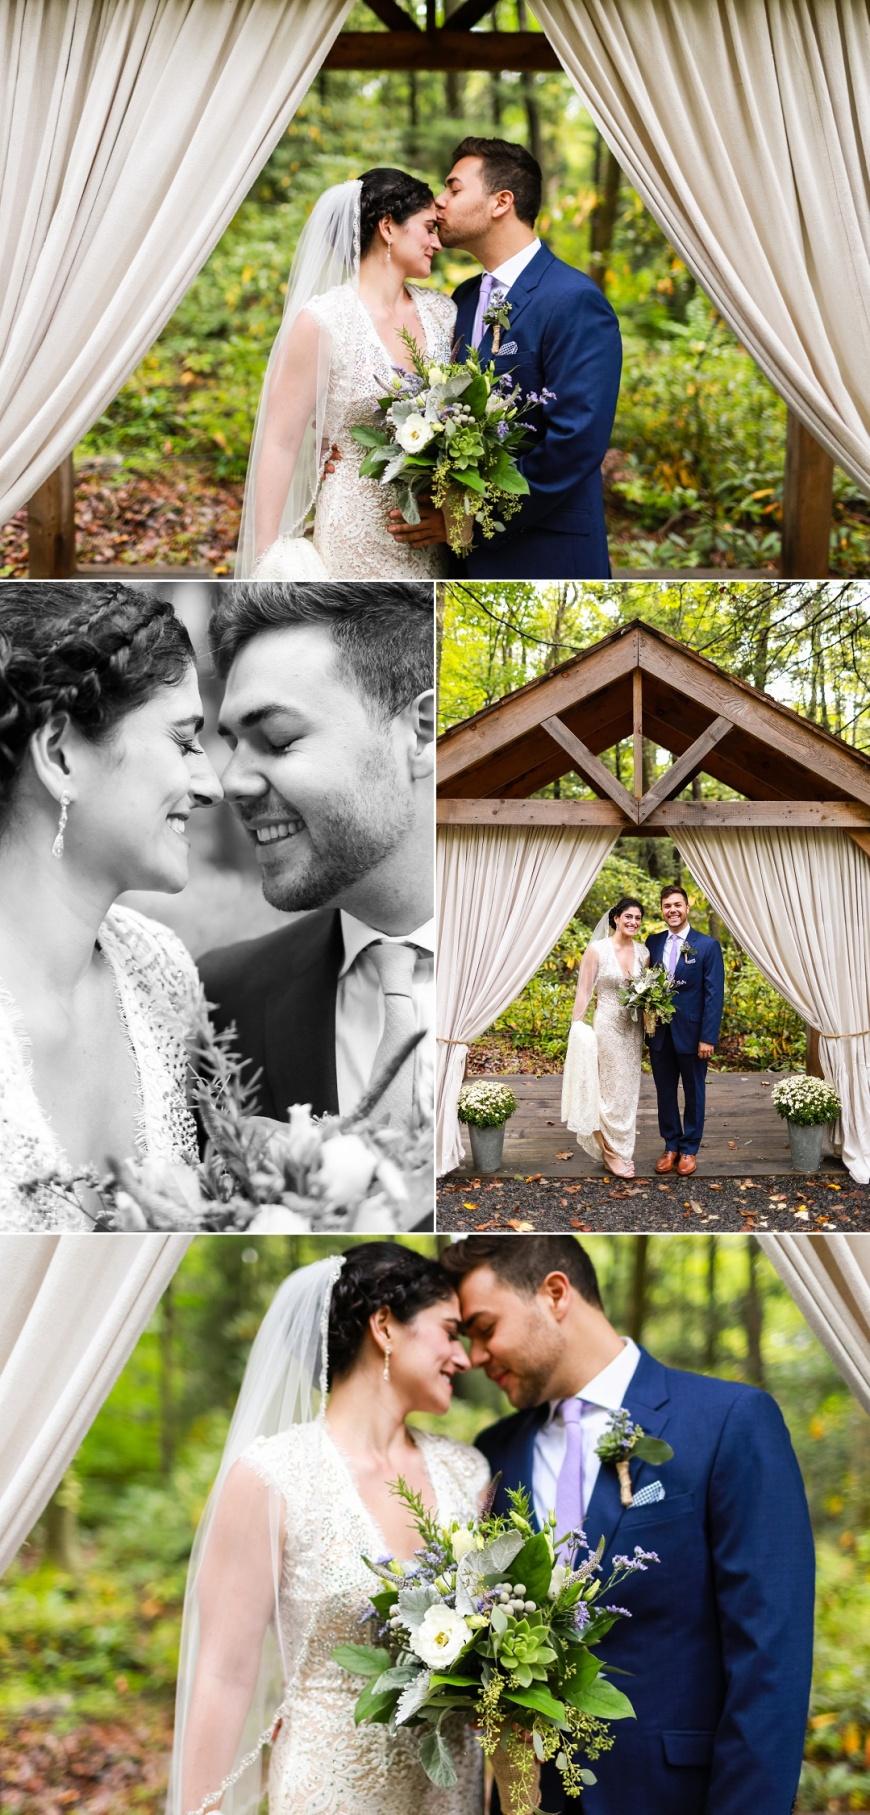 Tall-Timber-Barn-Poconos-Wedding-Photographer_1046.jpg